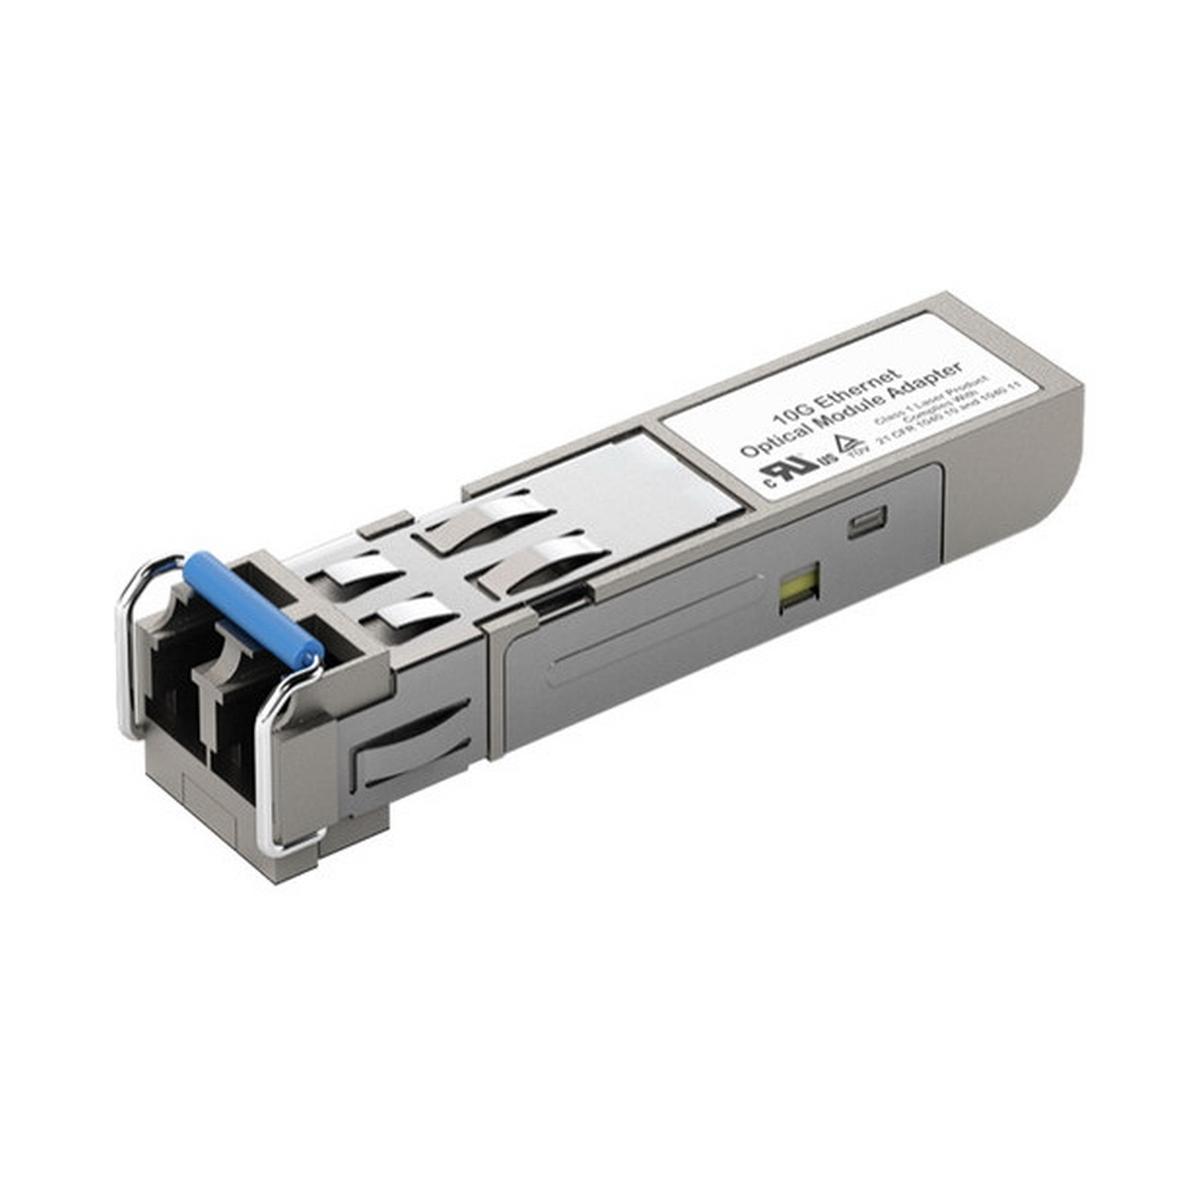 Blackmagic 10G Ethernet Optical Module